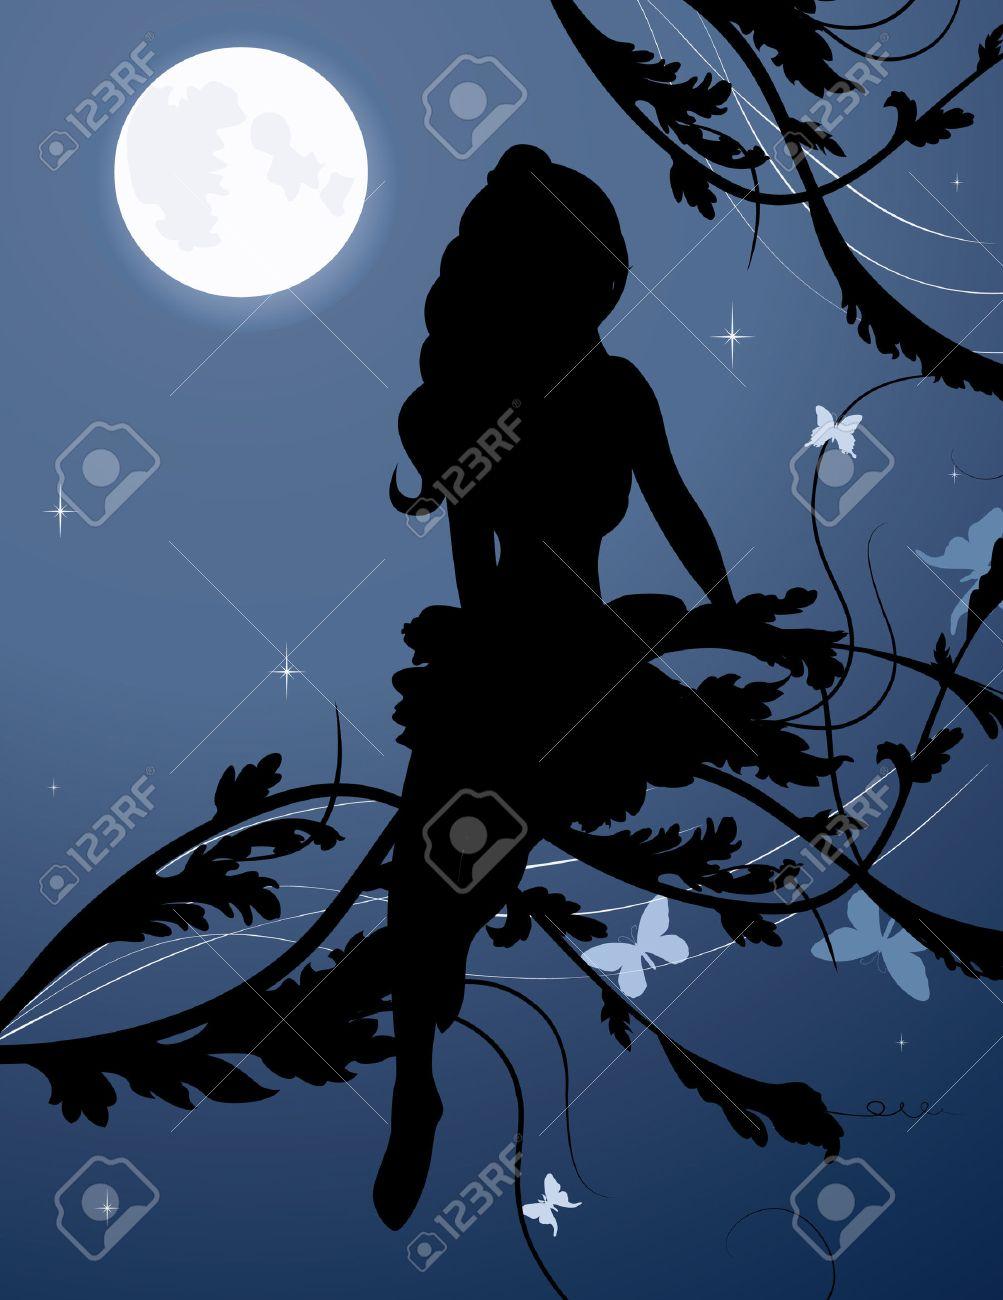 fairy silhouette in night sky vector illustration Stock Vector - 7281510